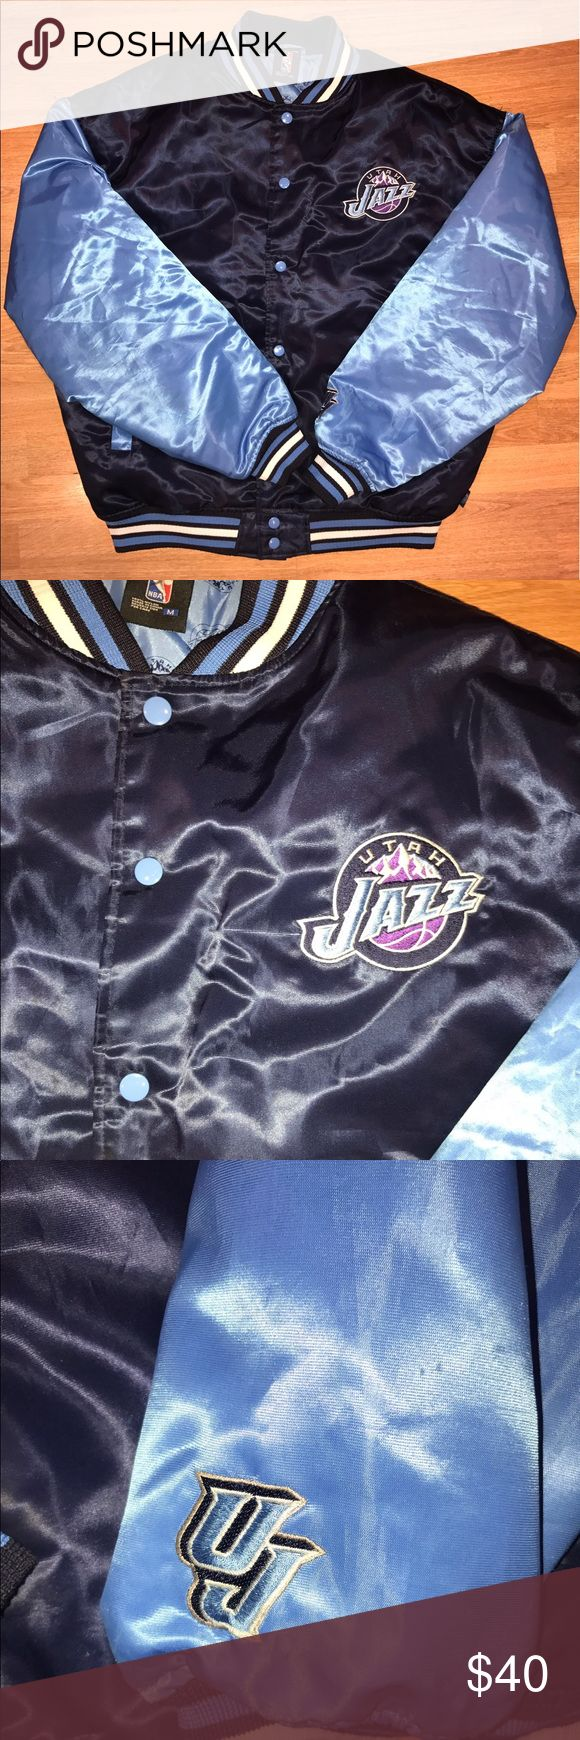 Utah jazz NBA medium men's puffer jacket Men's medium puffer jacket in excellent condition NBA Jackets & Coats Puffers